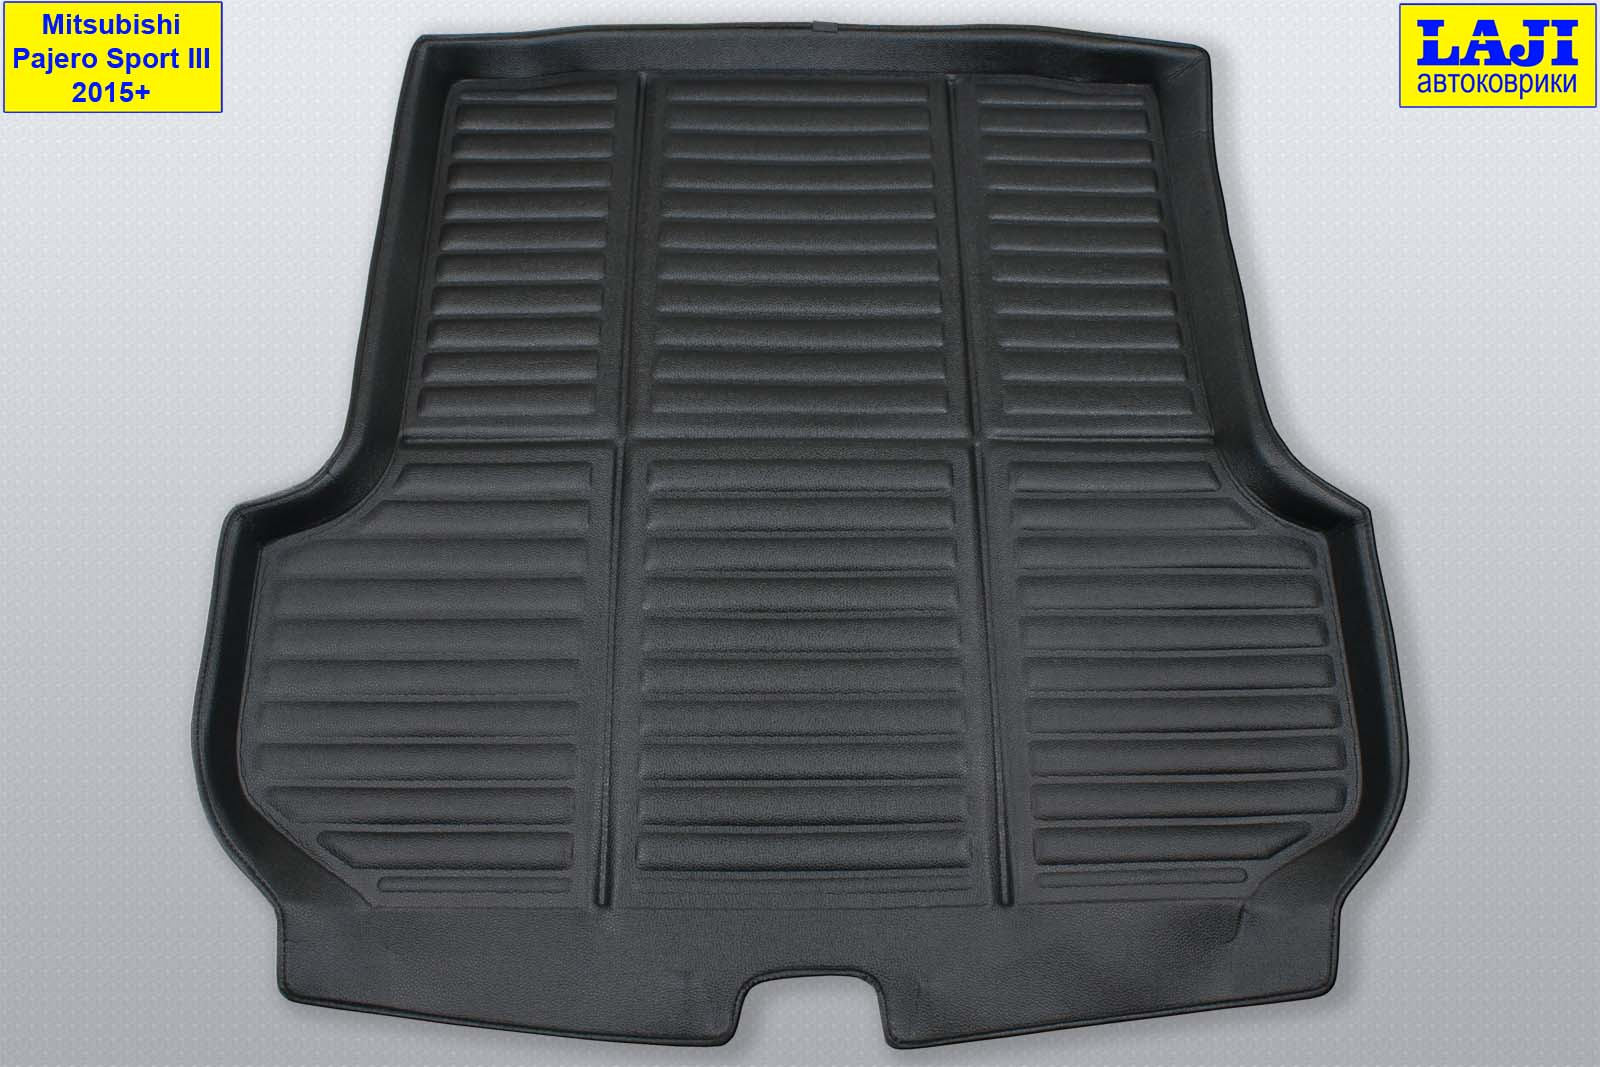 3D коврик в багажник Mitsubishi Pajero Sport III 2015-н.в. 1